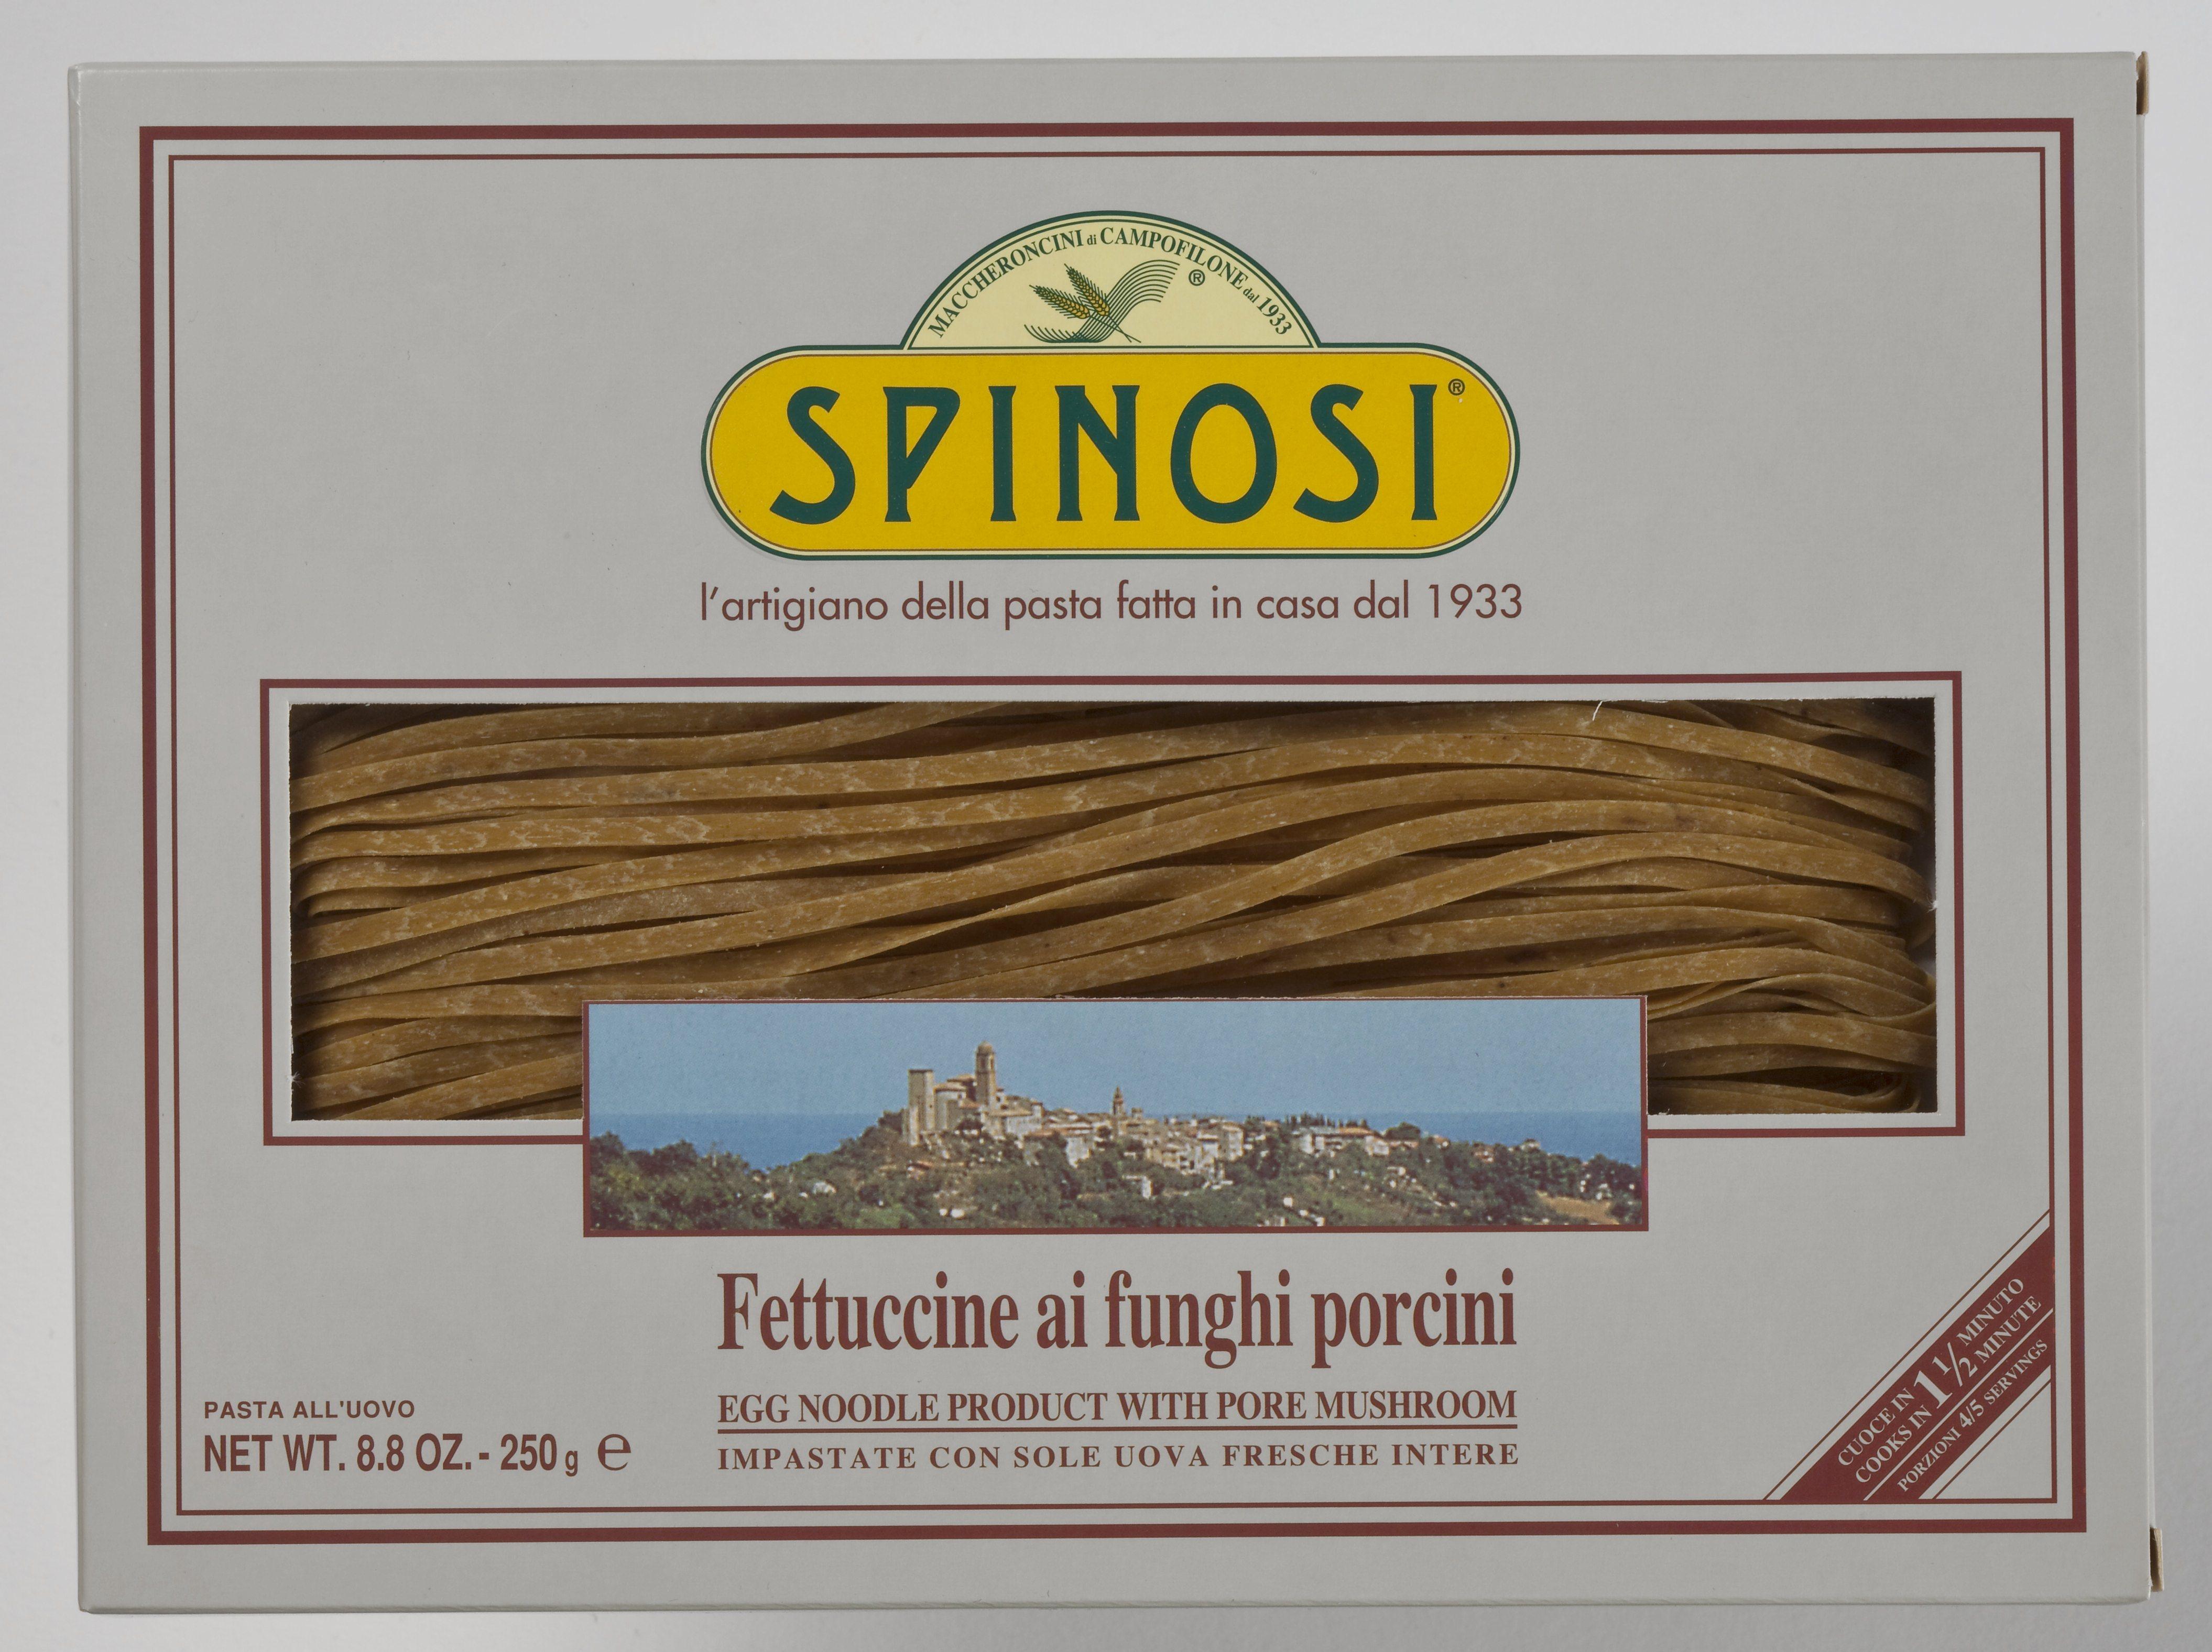 Fettuccine ai funghi porcini 250 g Spinosi